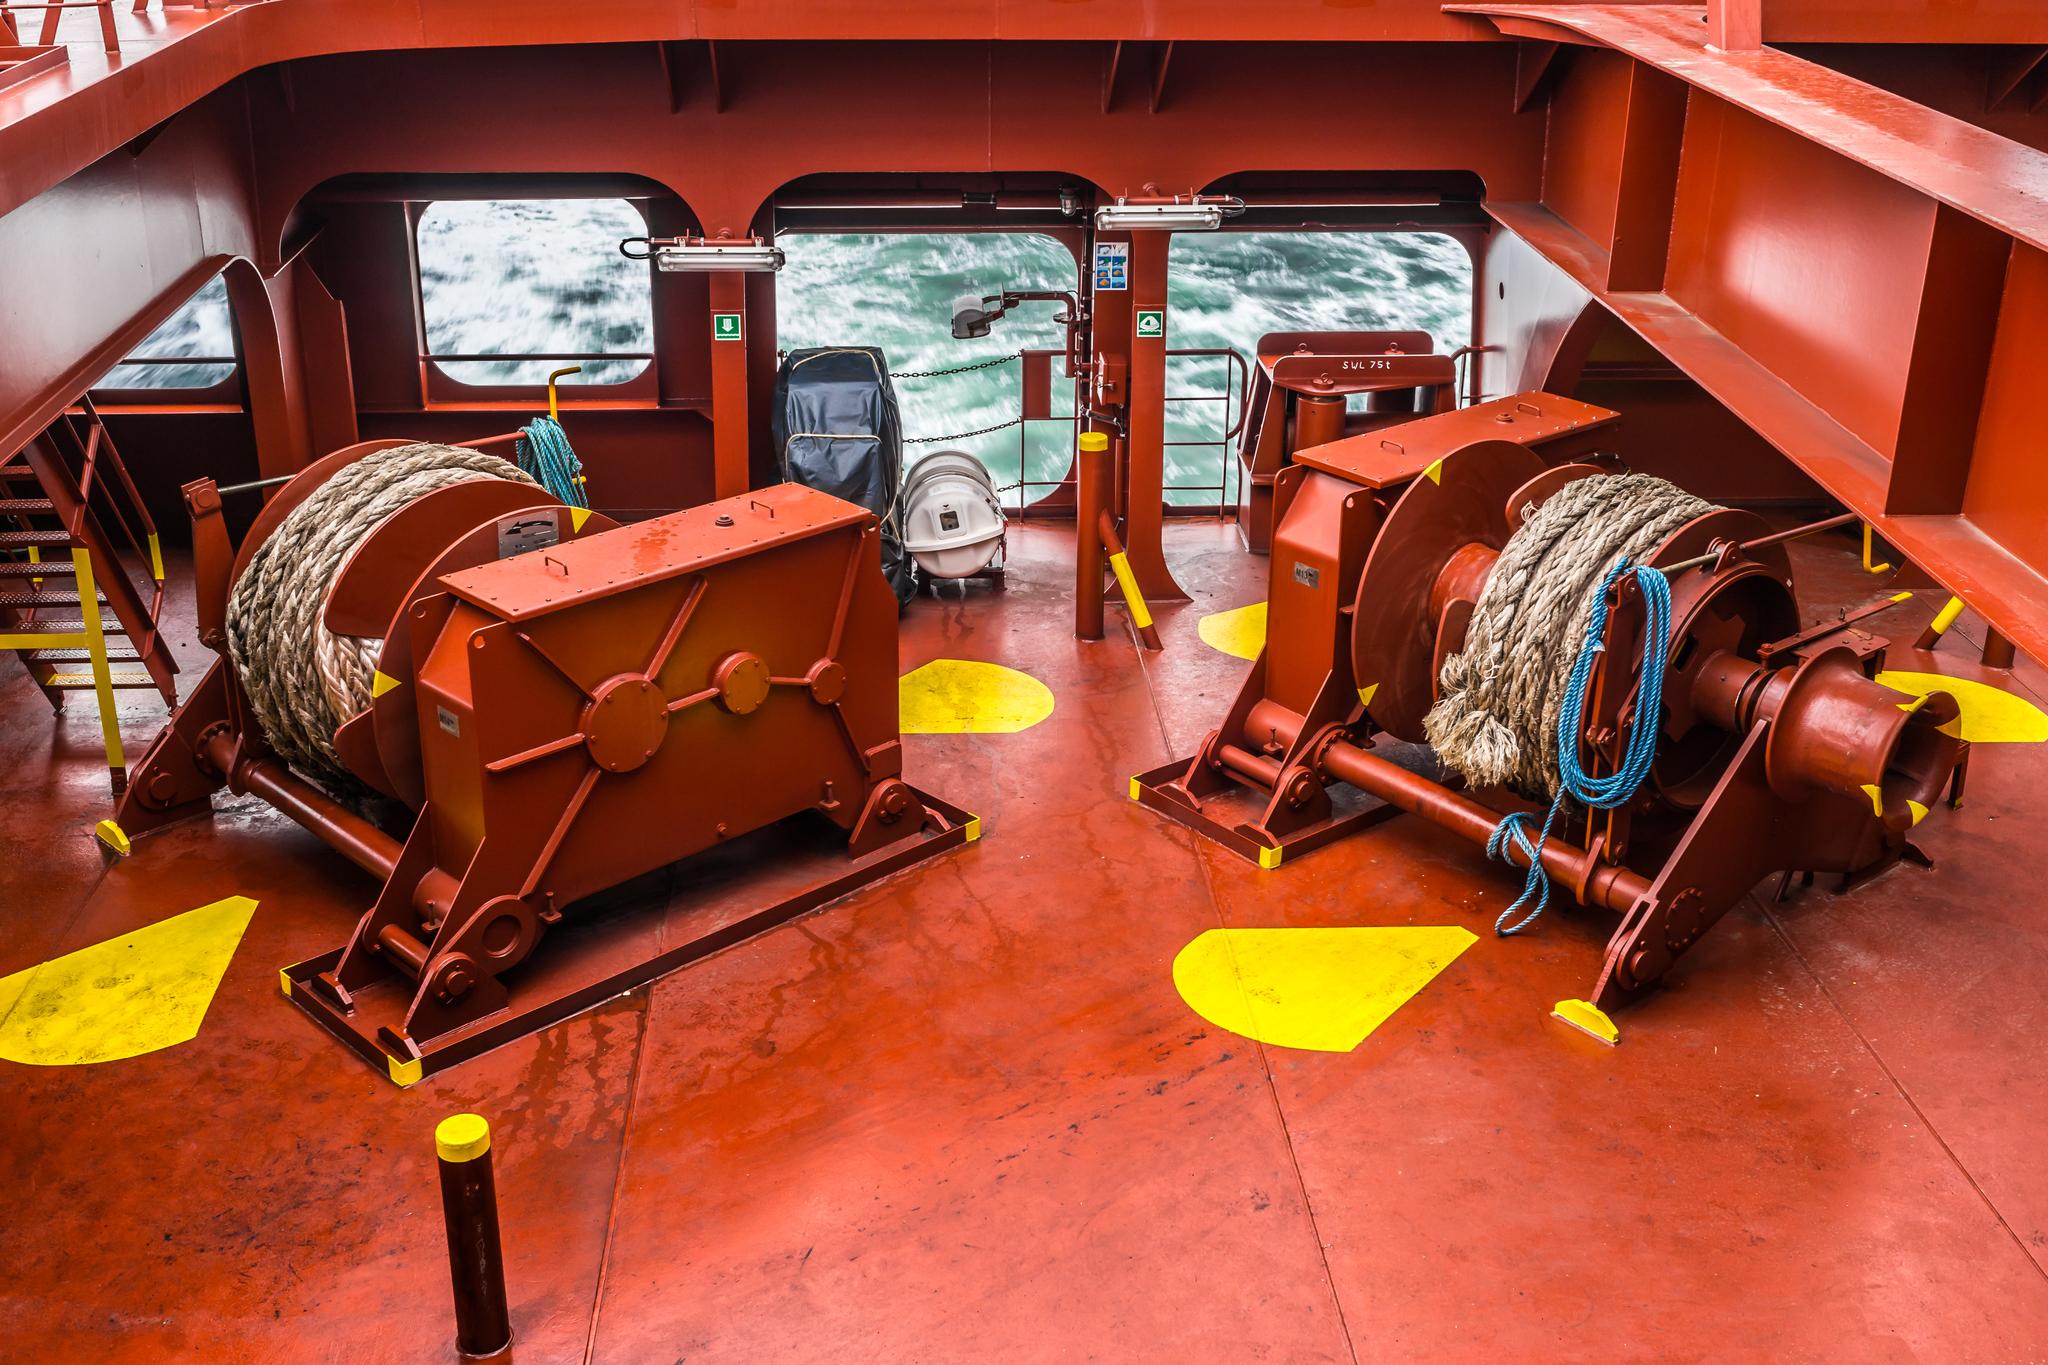 Windy cumownicze na rufie Mayview Maersk (fot. Robert Urbaniak)